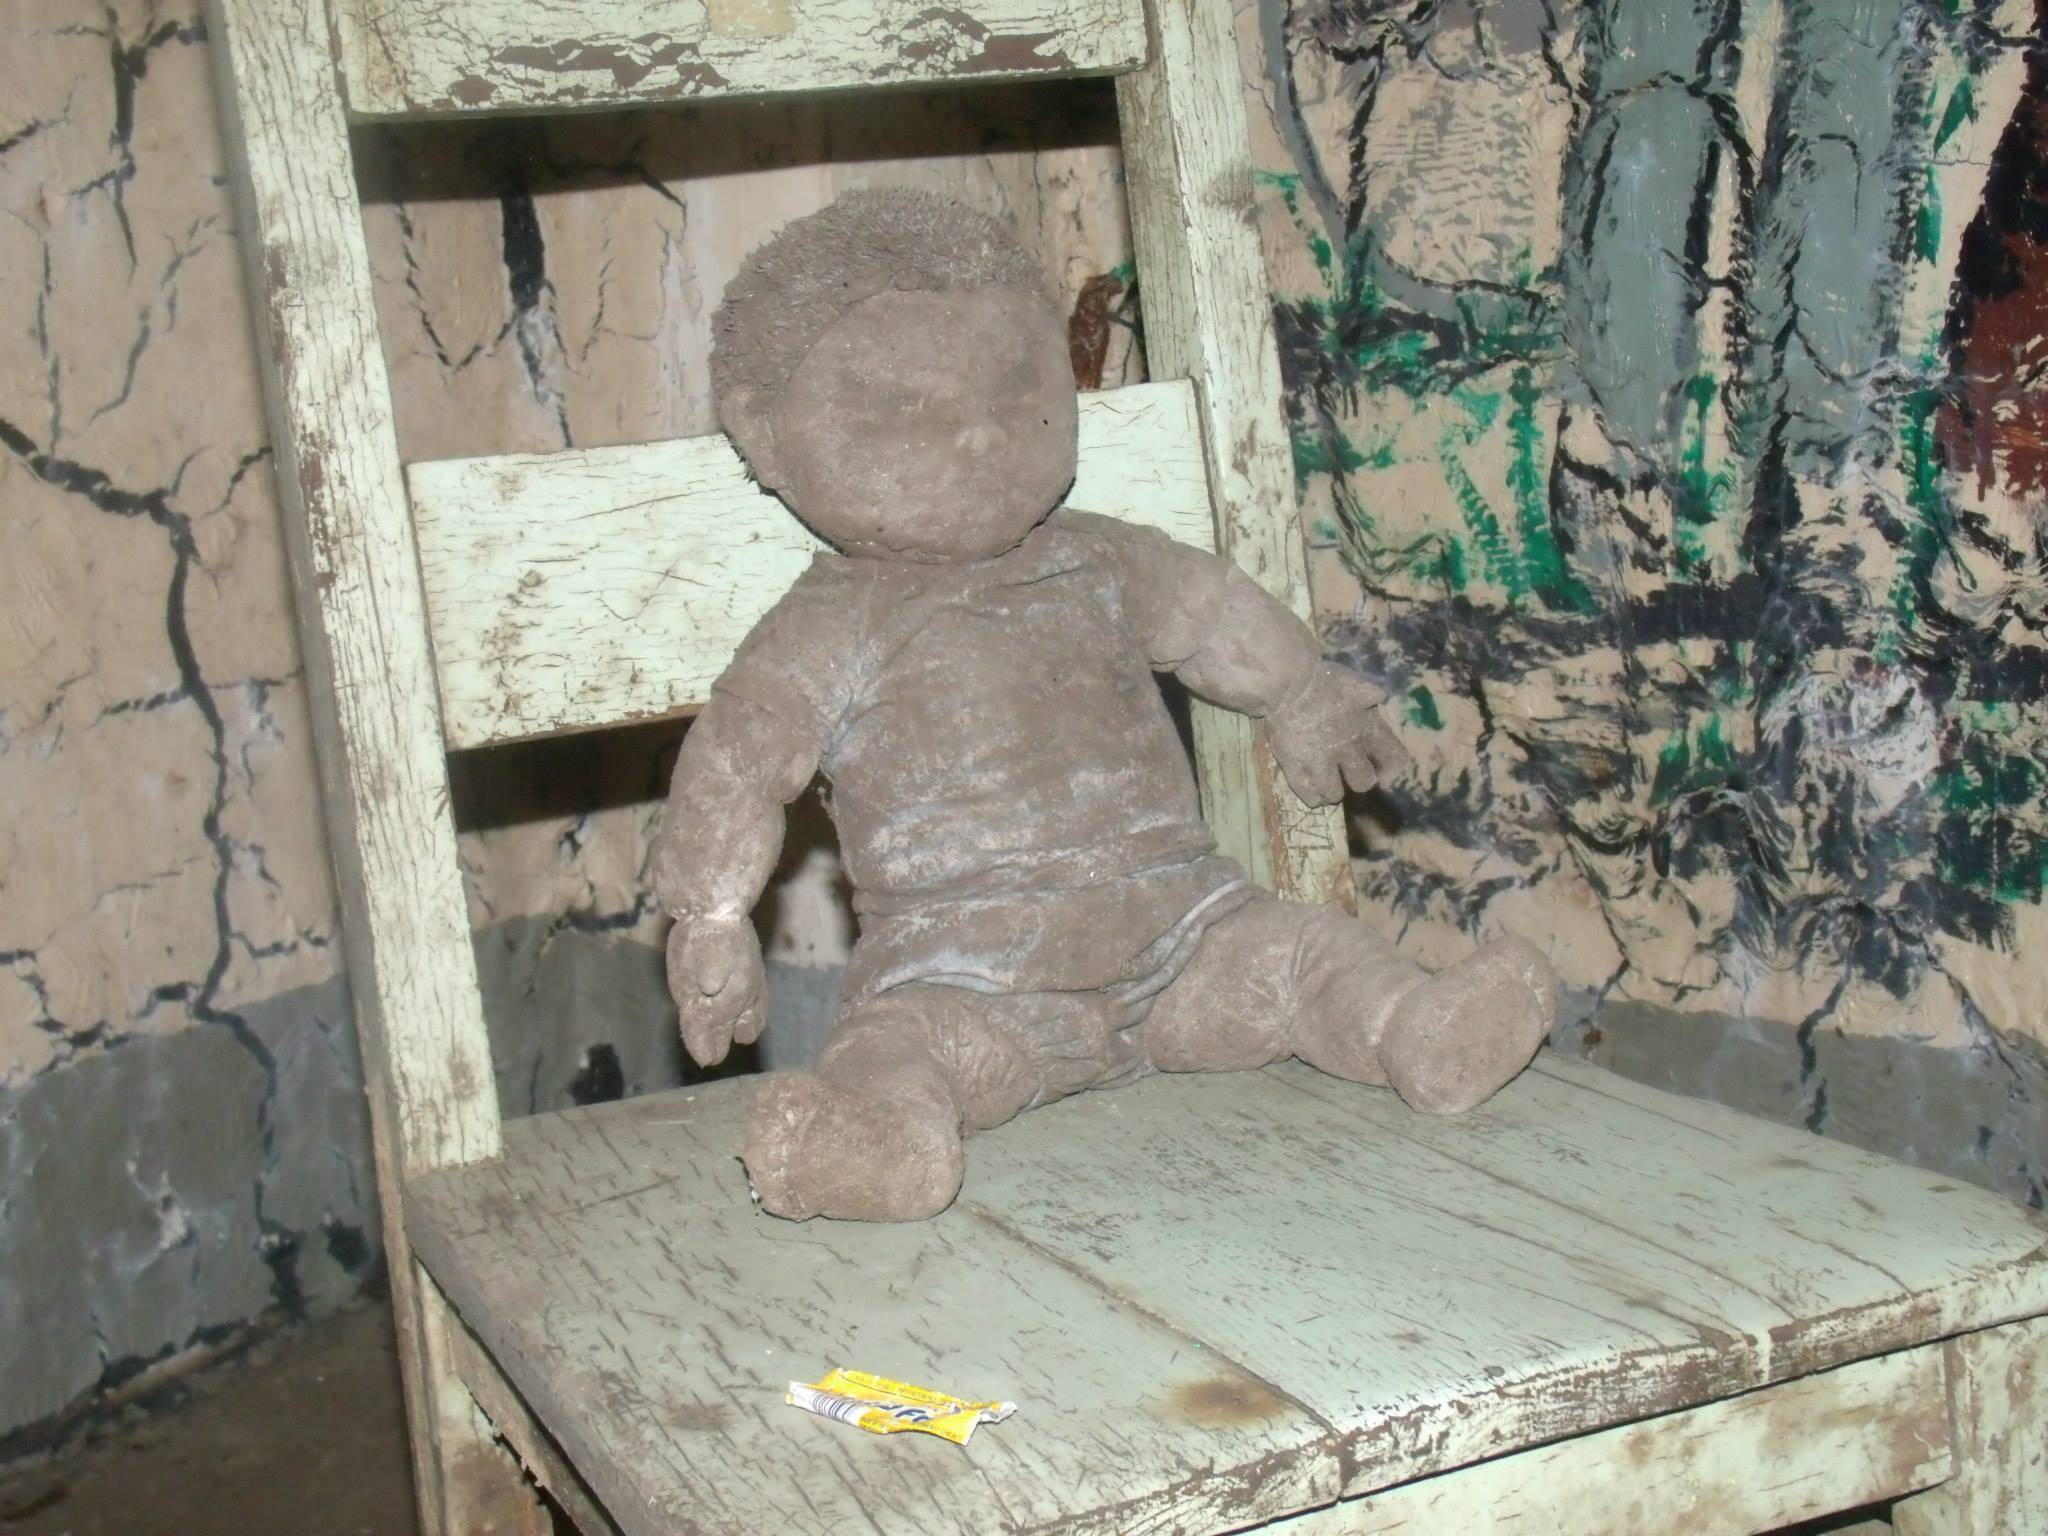 Creepy Doll - Pennhurst